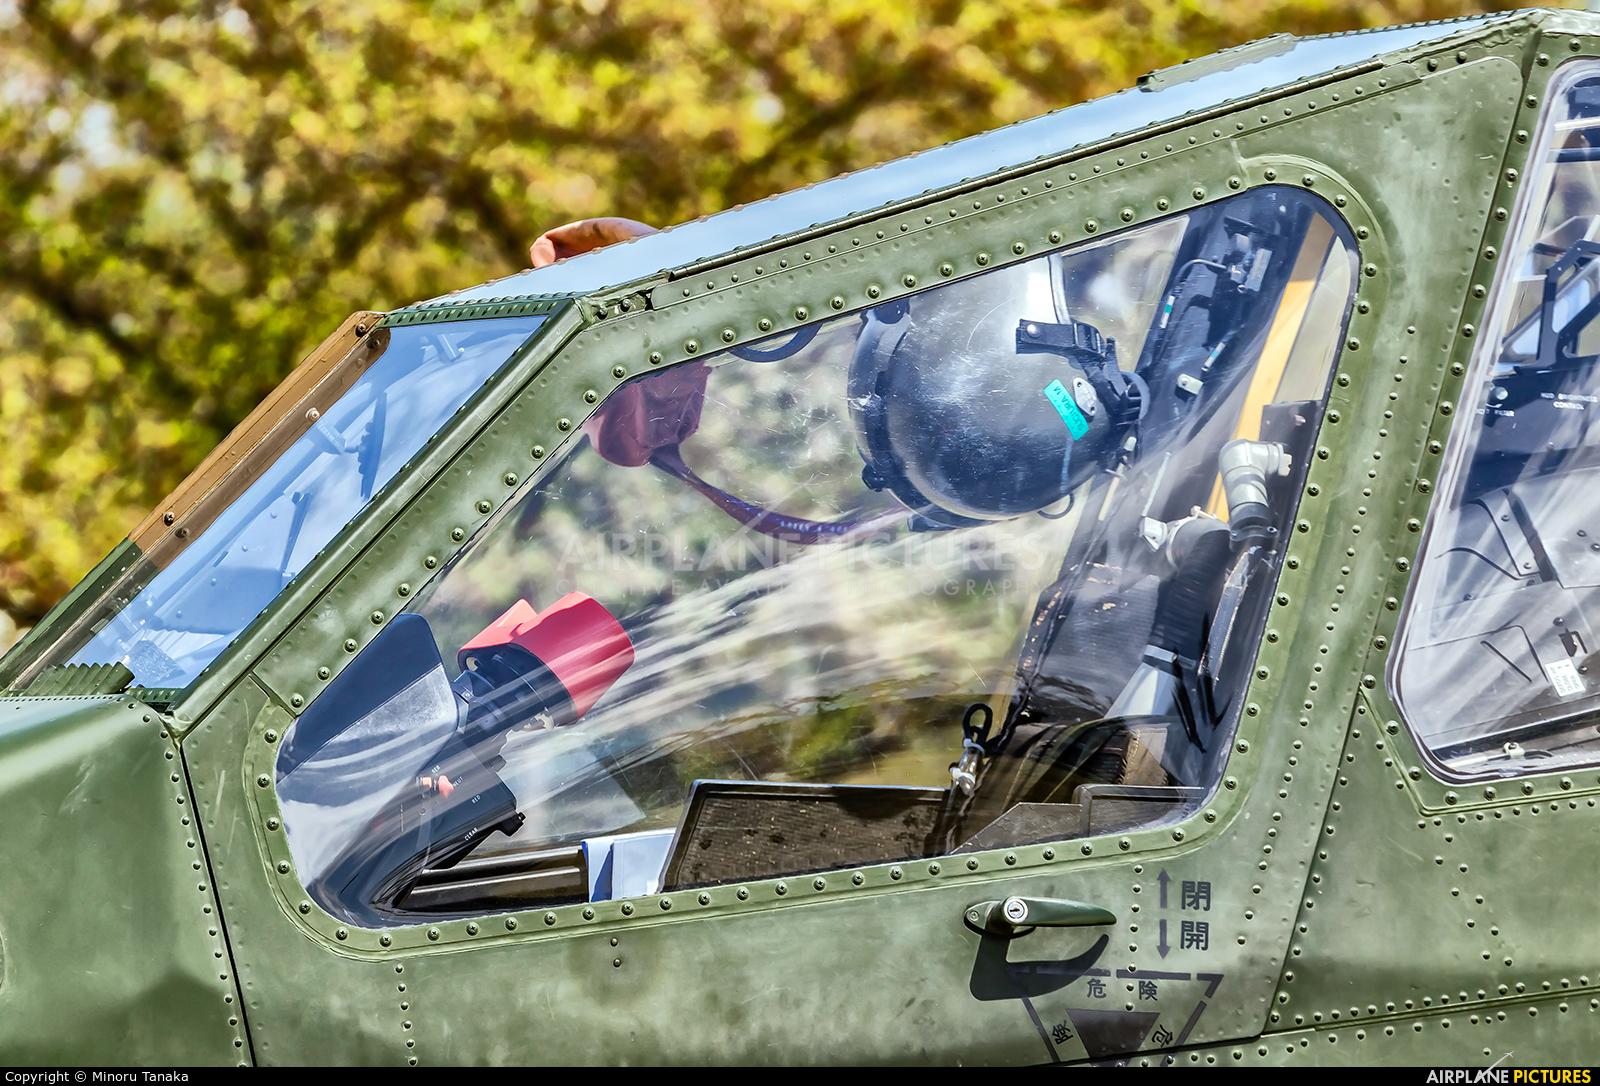 Japan - Ground Self Defense Force 73449 aircraft at Off Airport - Japan